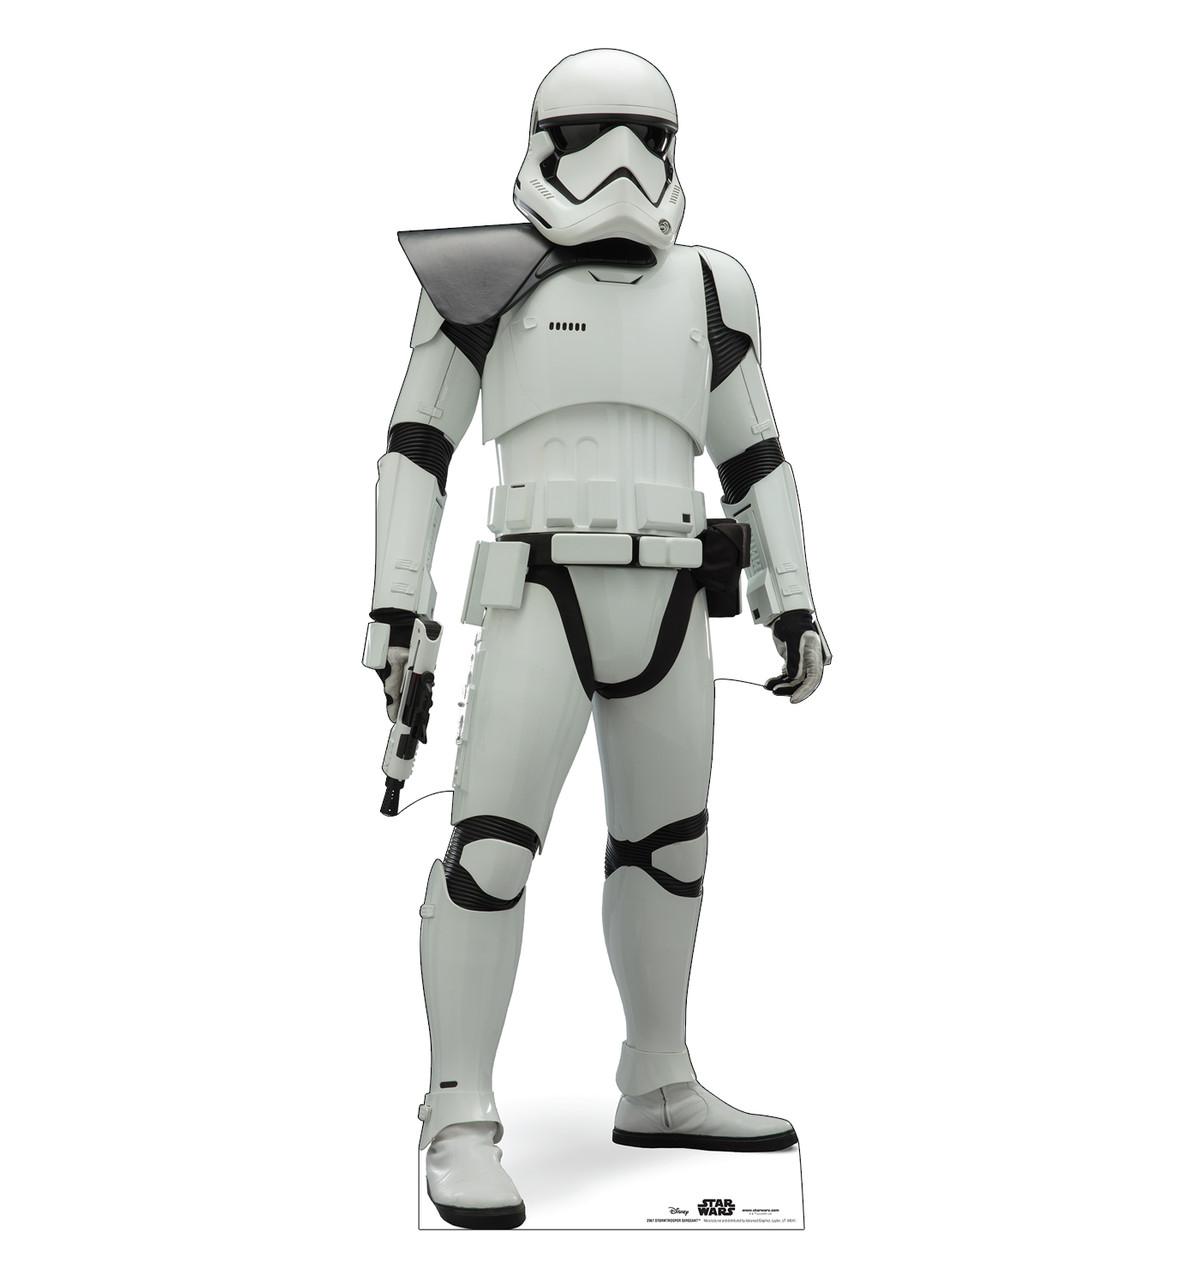 Life-size cardboard standee of Stormtrooper Sergeant™ (Star Wars IX).